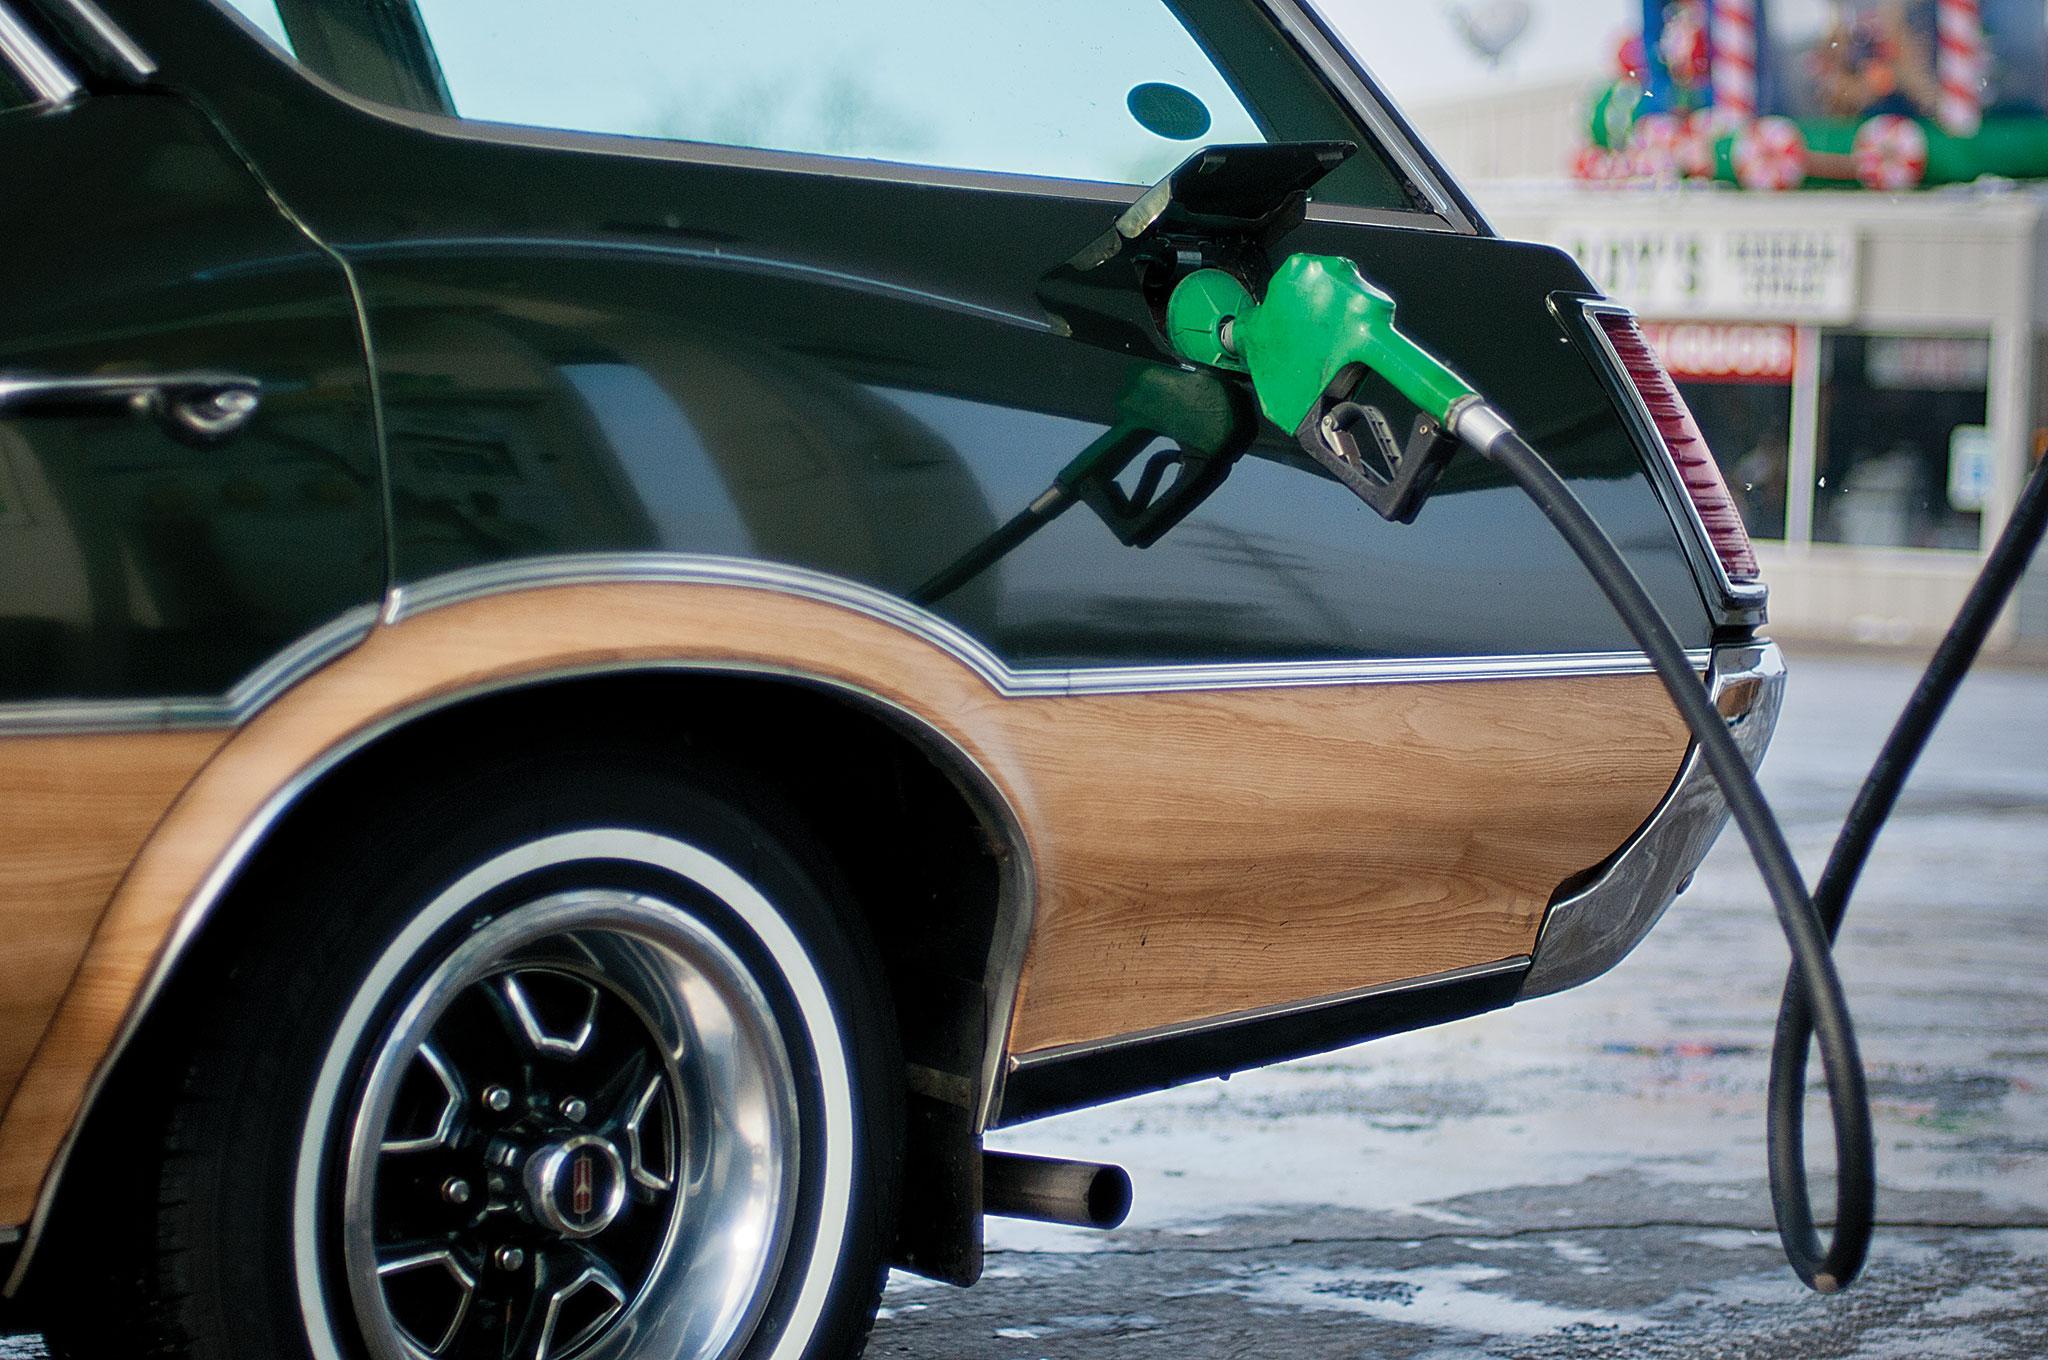 Olds Vista Cruiser fill gas